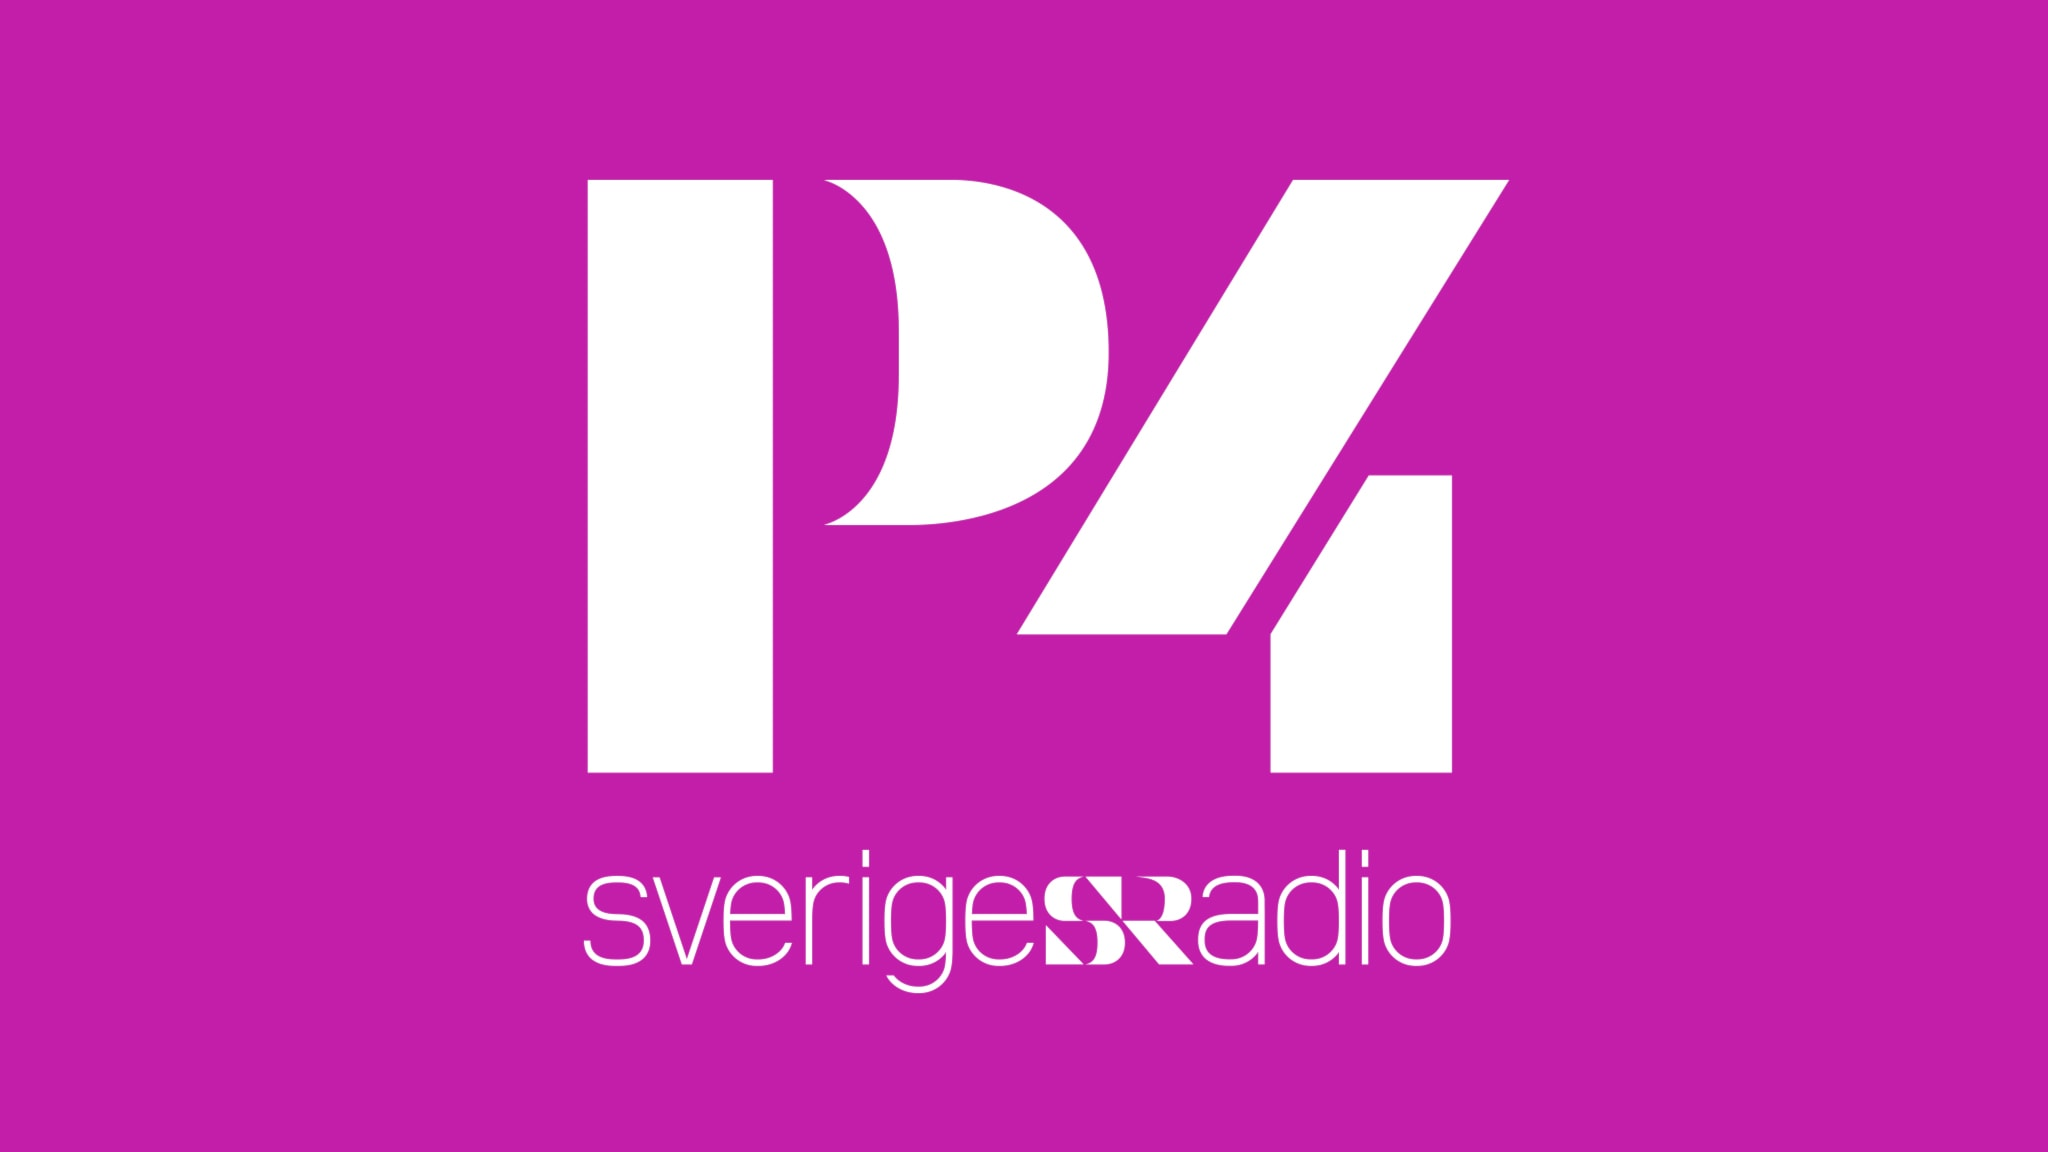 Trafik P4 Stockholm 20190625 09.41 (00.45)